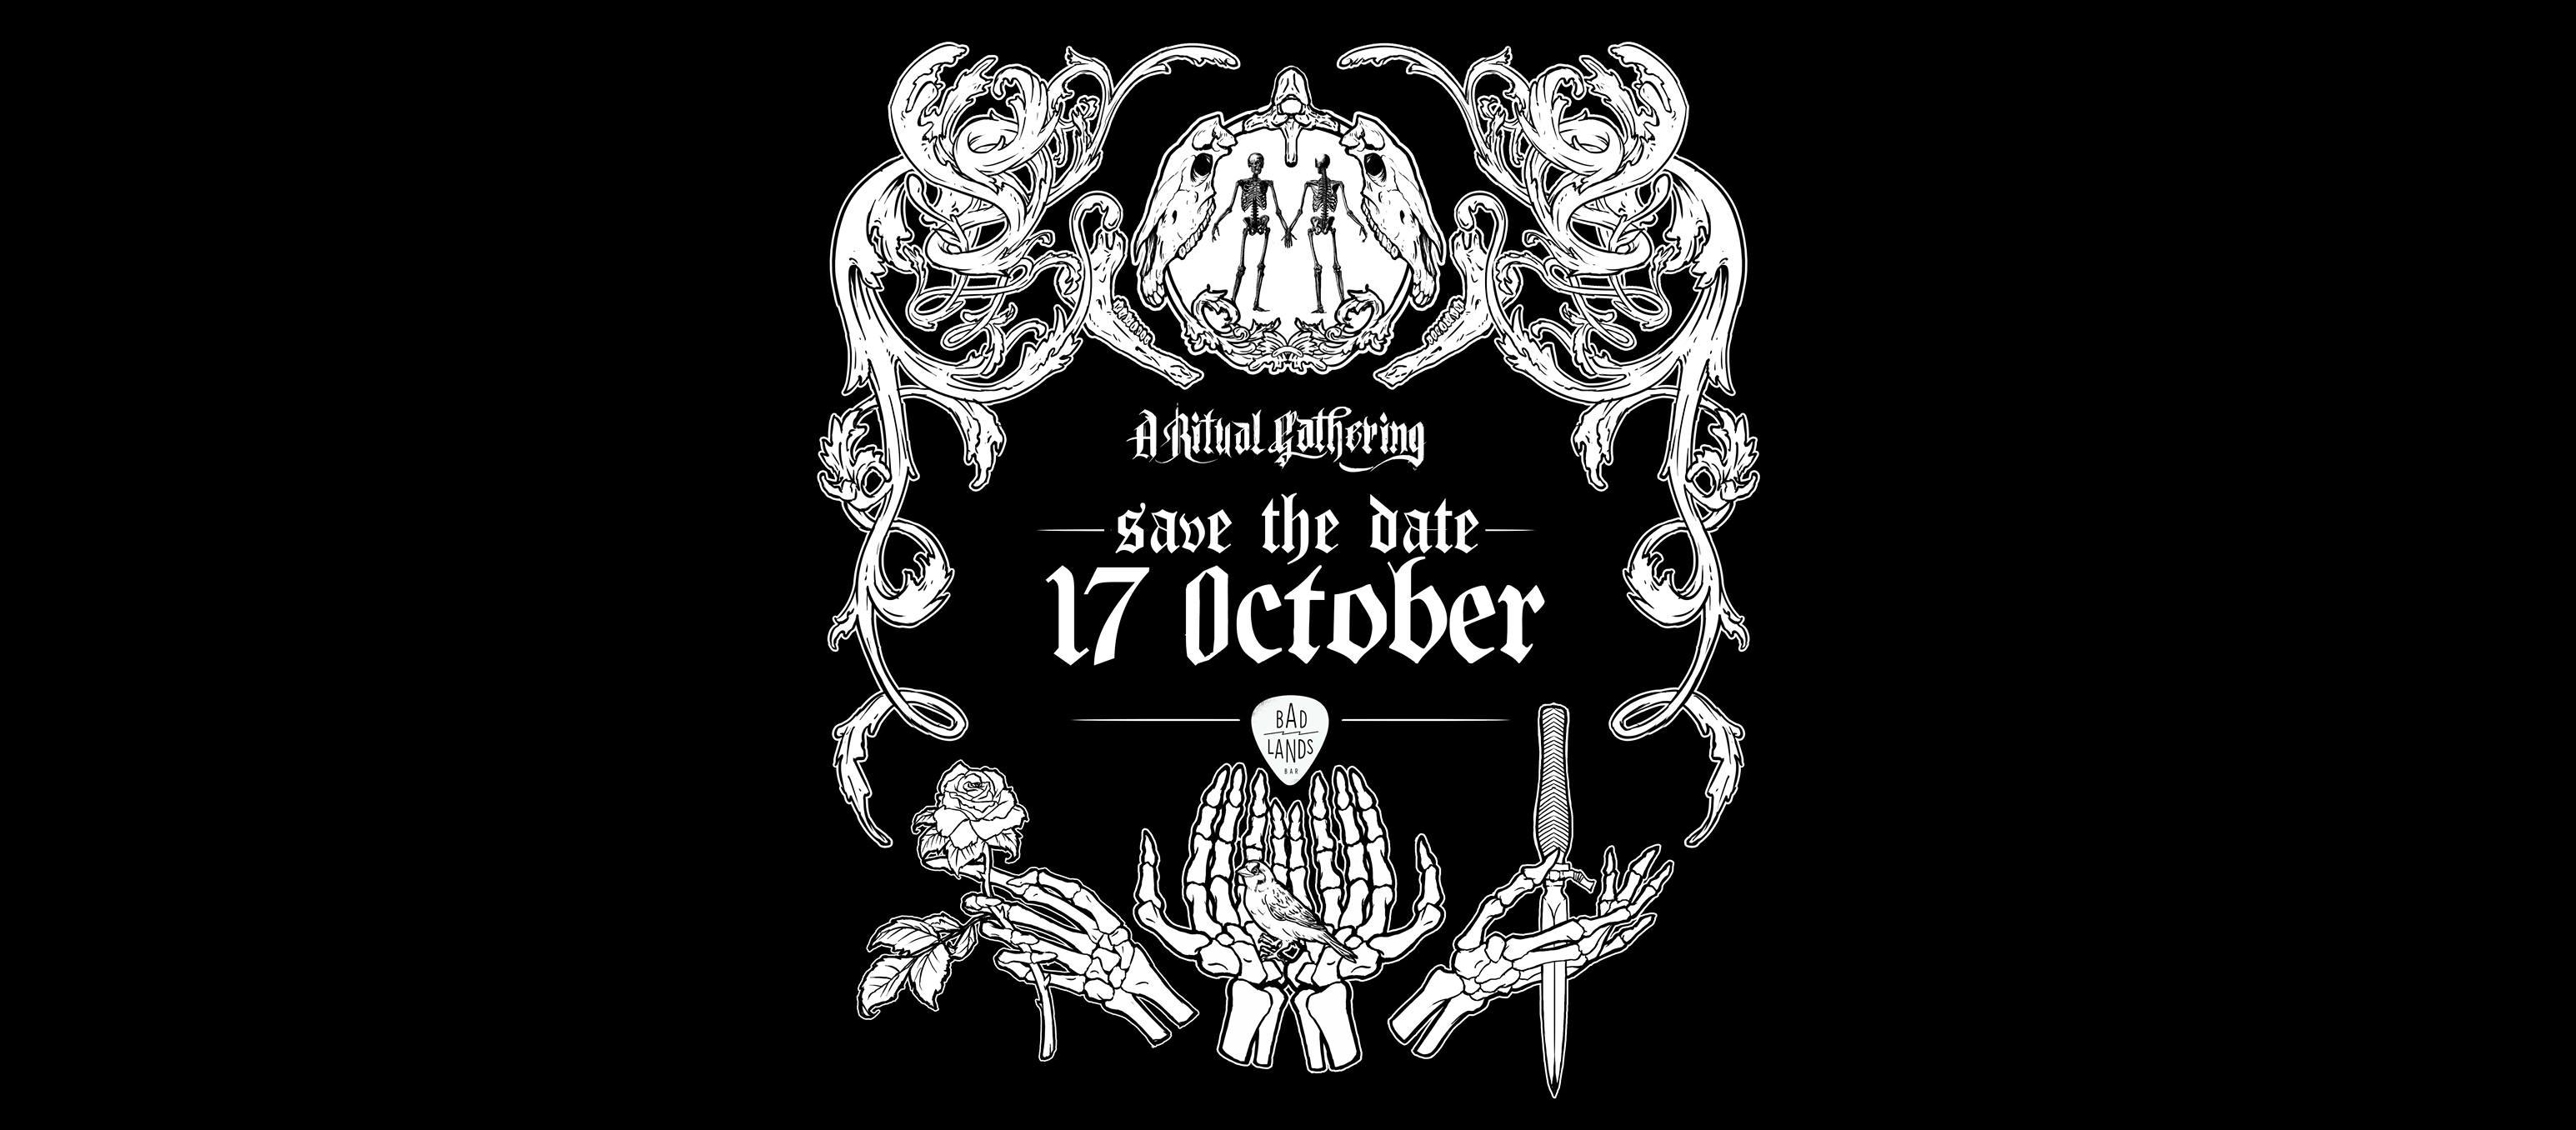 ✚ A Ritual Gathering  ✚